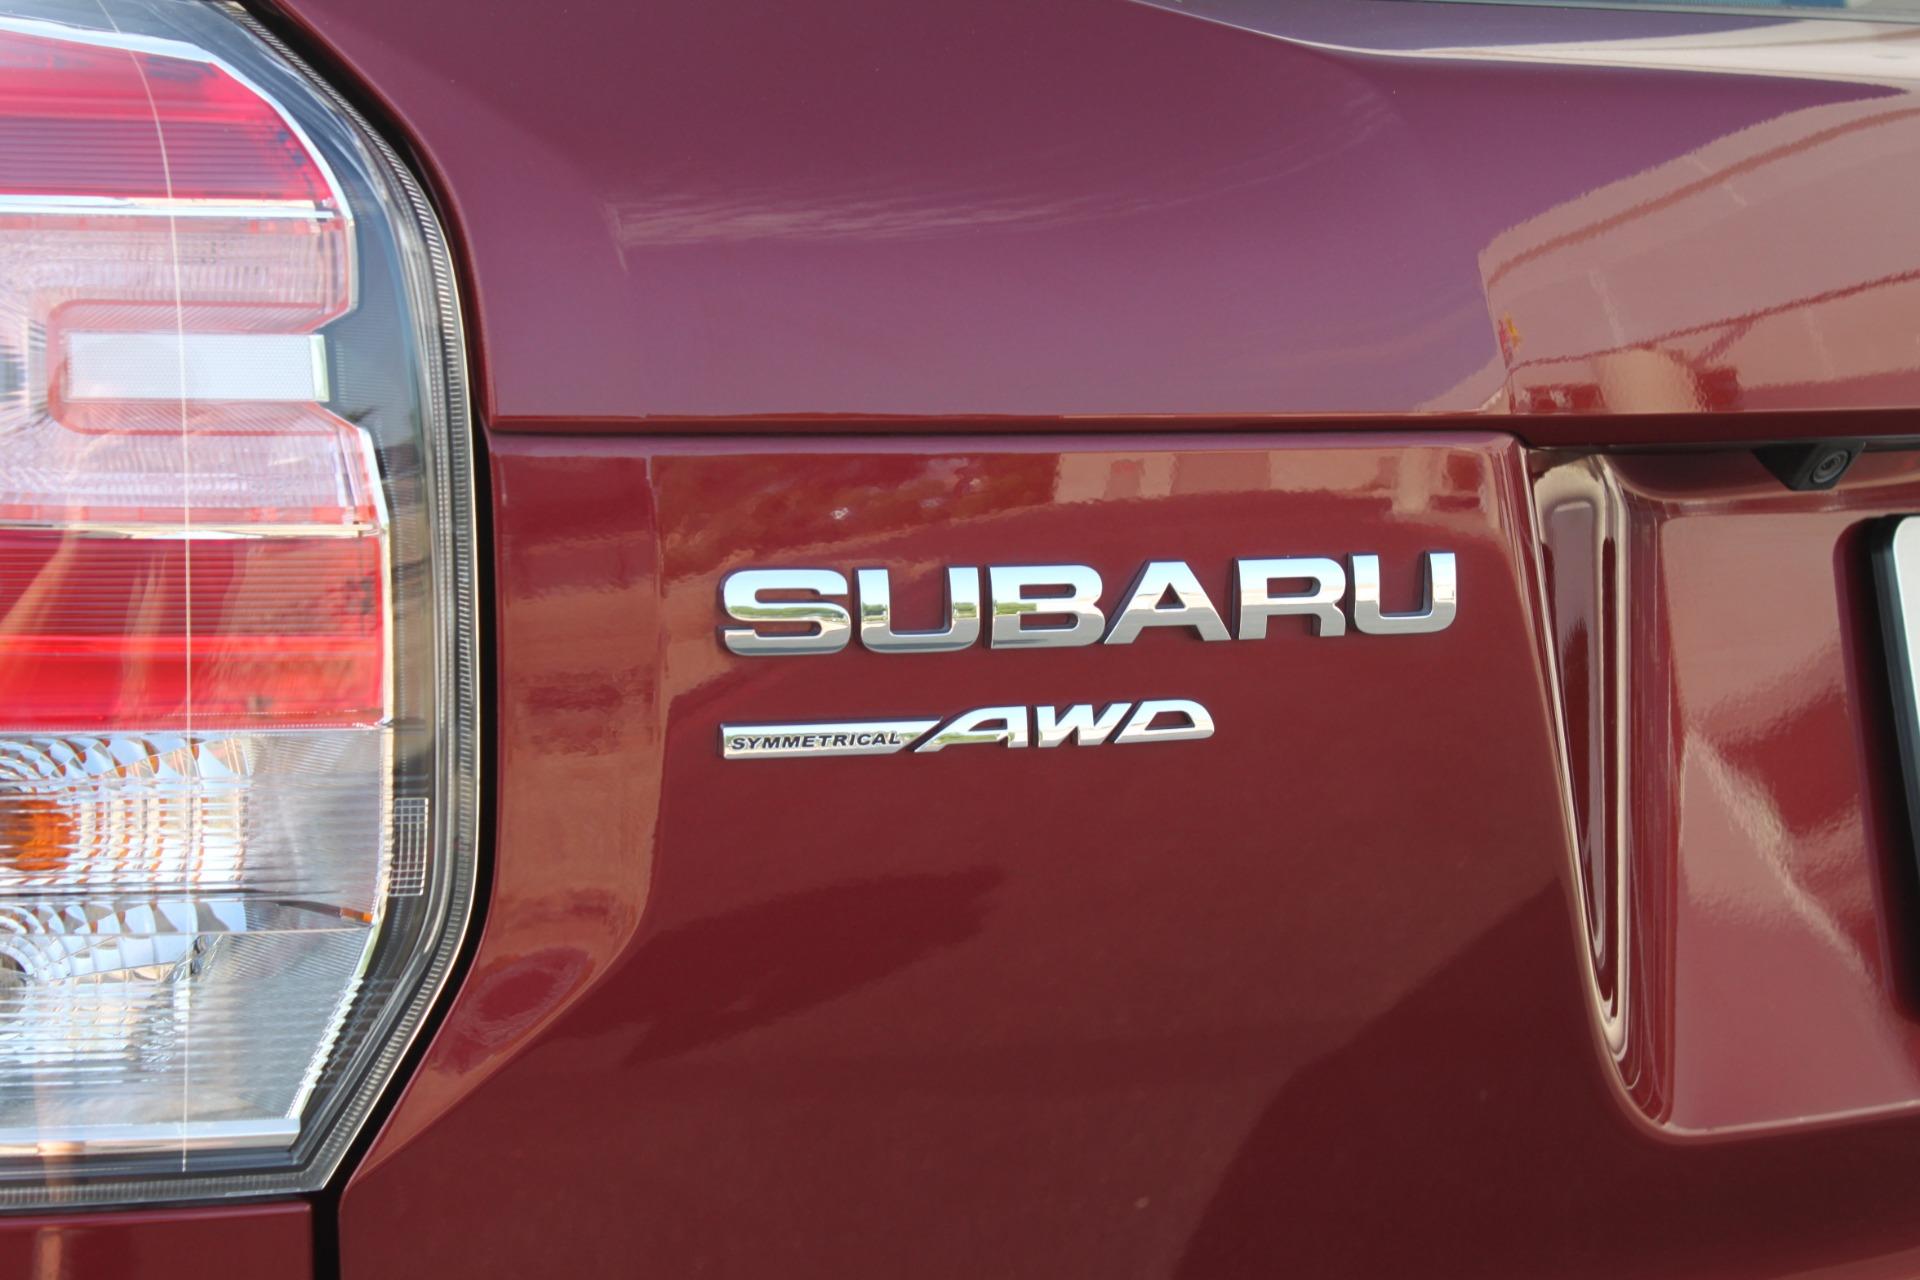 Used-2017-Subaru-Forester-25i-All-Wheel-Drive-25i-LS430